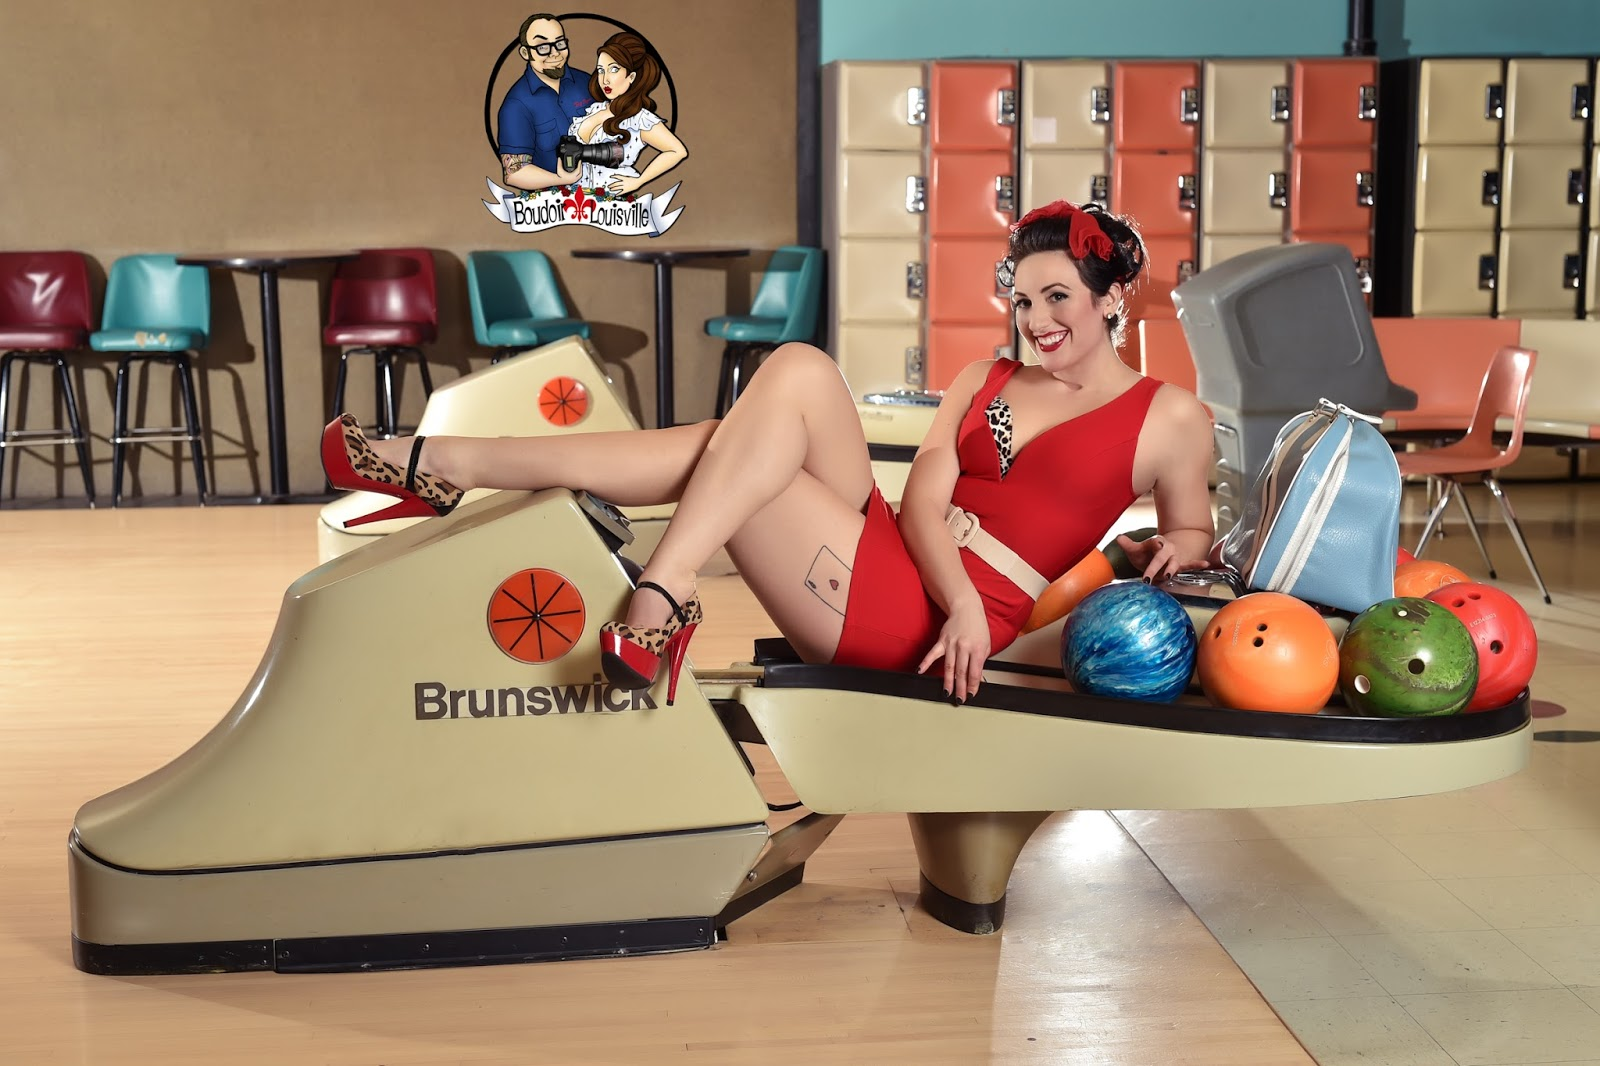 Pin up girl bowling